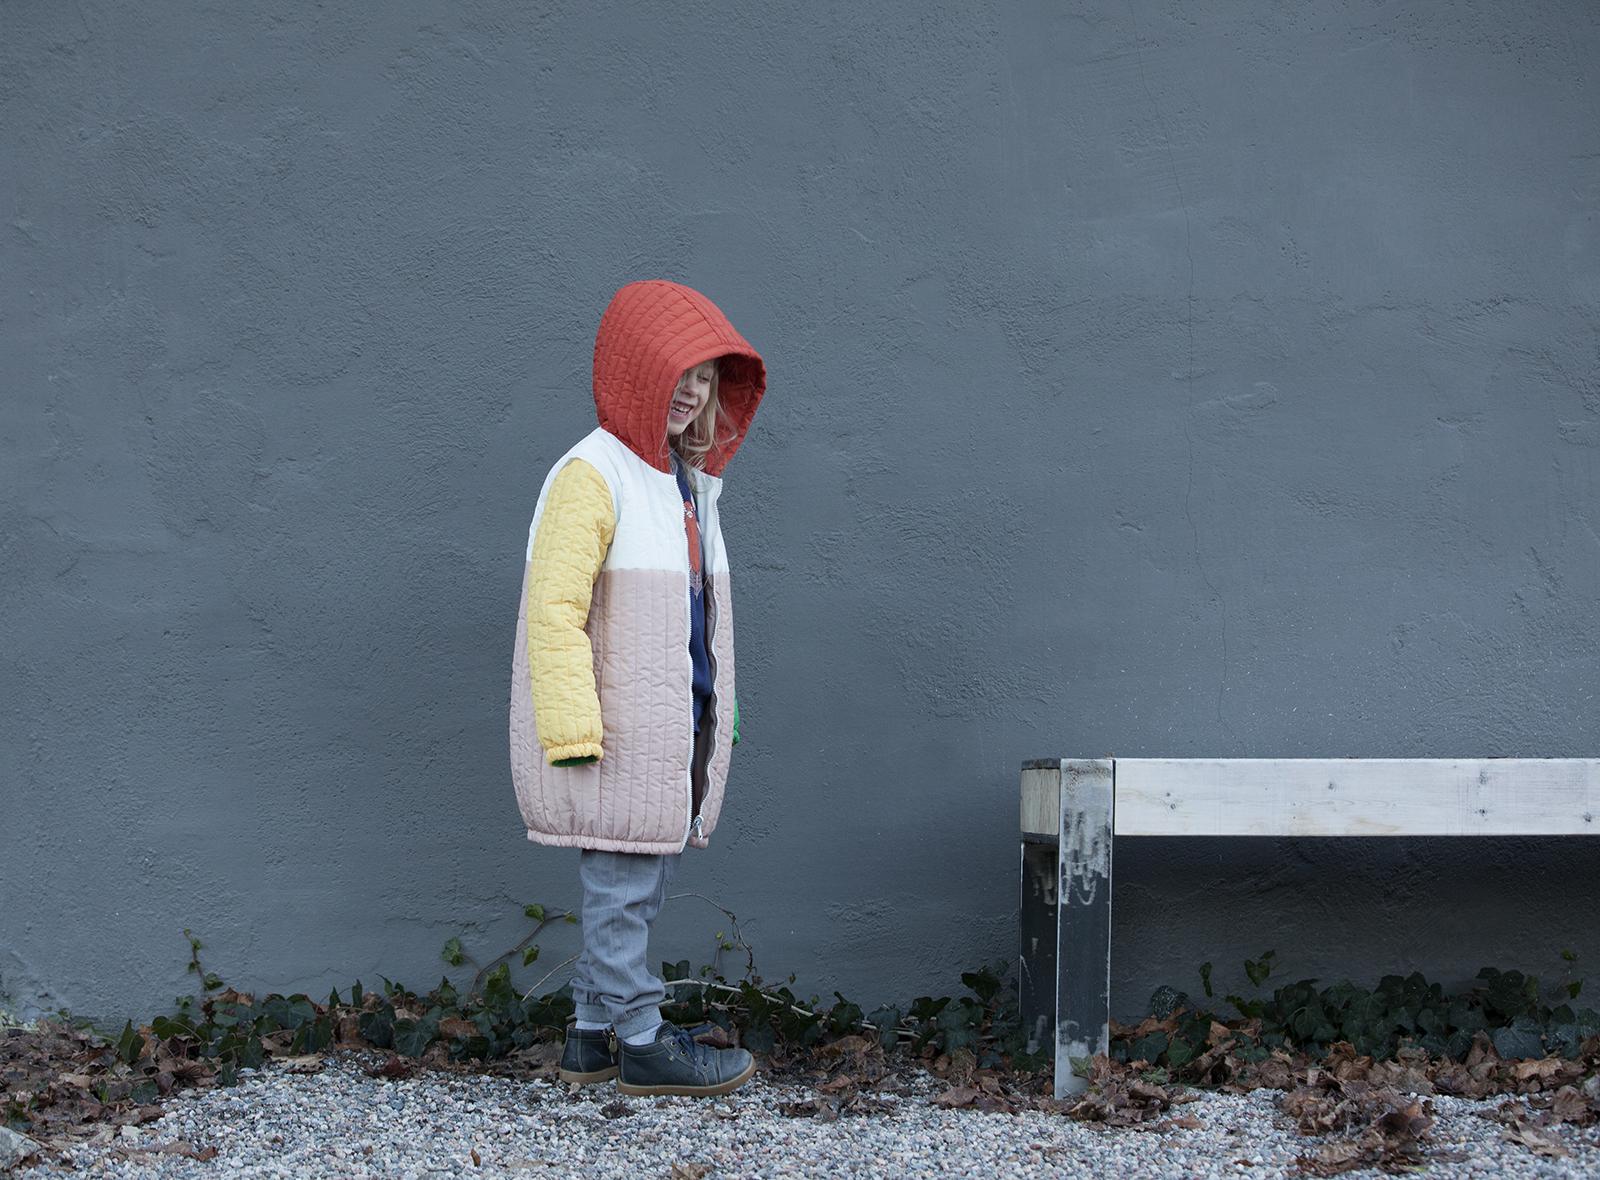 Kidsfashion barnmode bobo choses babyshop amelie von essen amelies hus snygga barnkläder coola